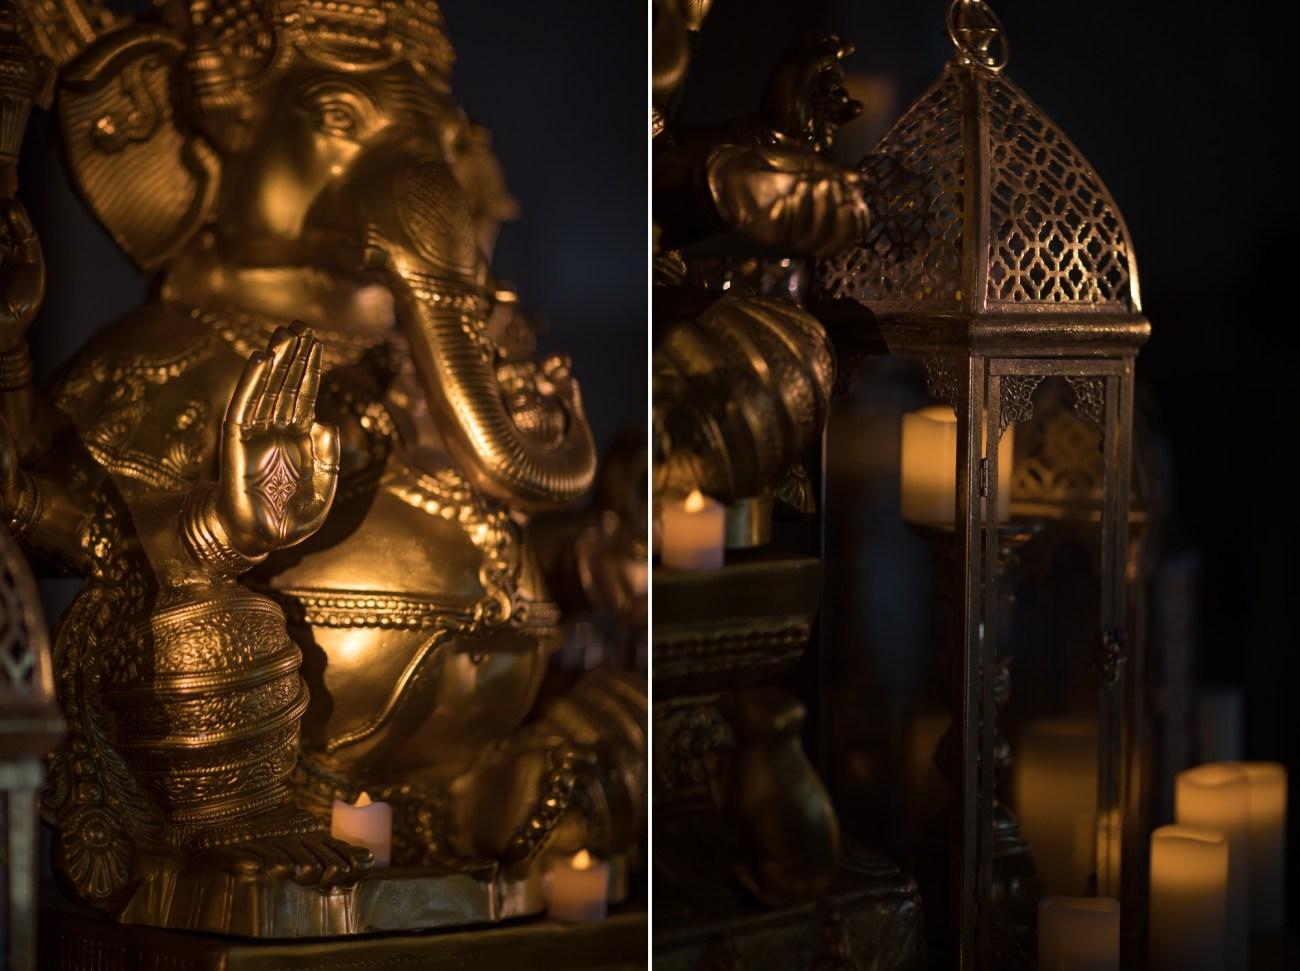 florida-indian-wedding-decorators-5 Indian Wedding Decoration in Florida | Ganesha Statue